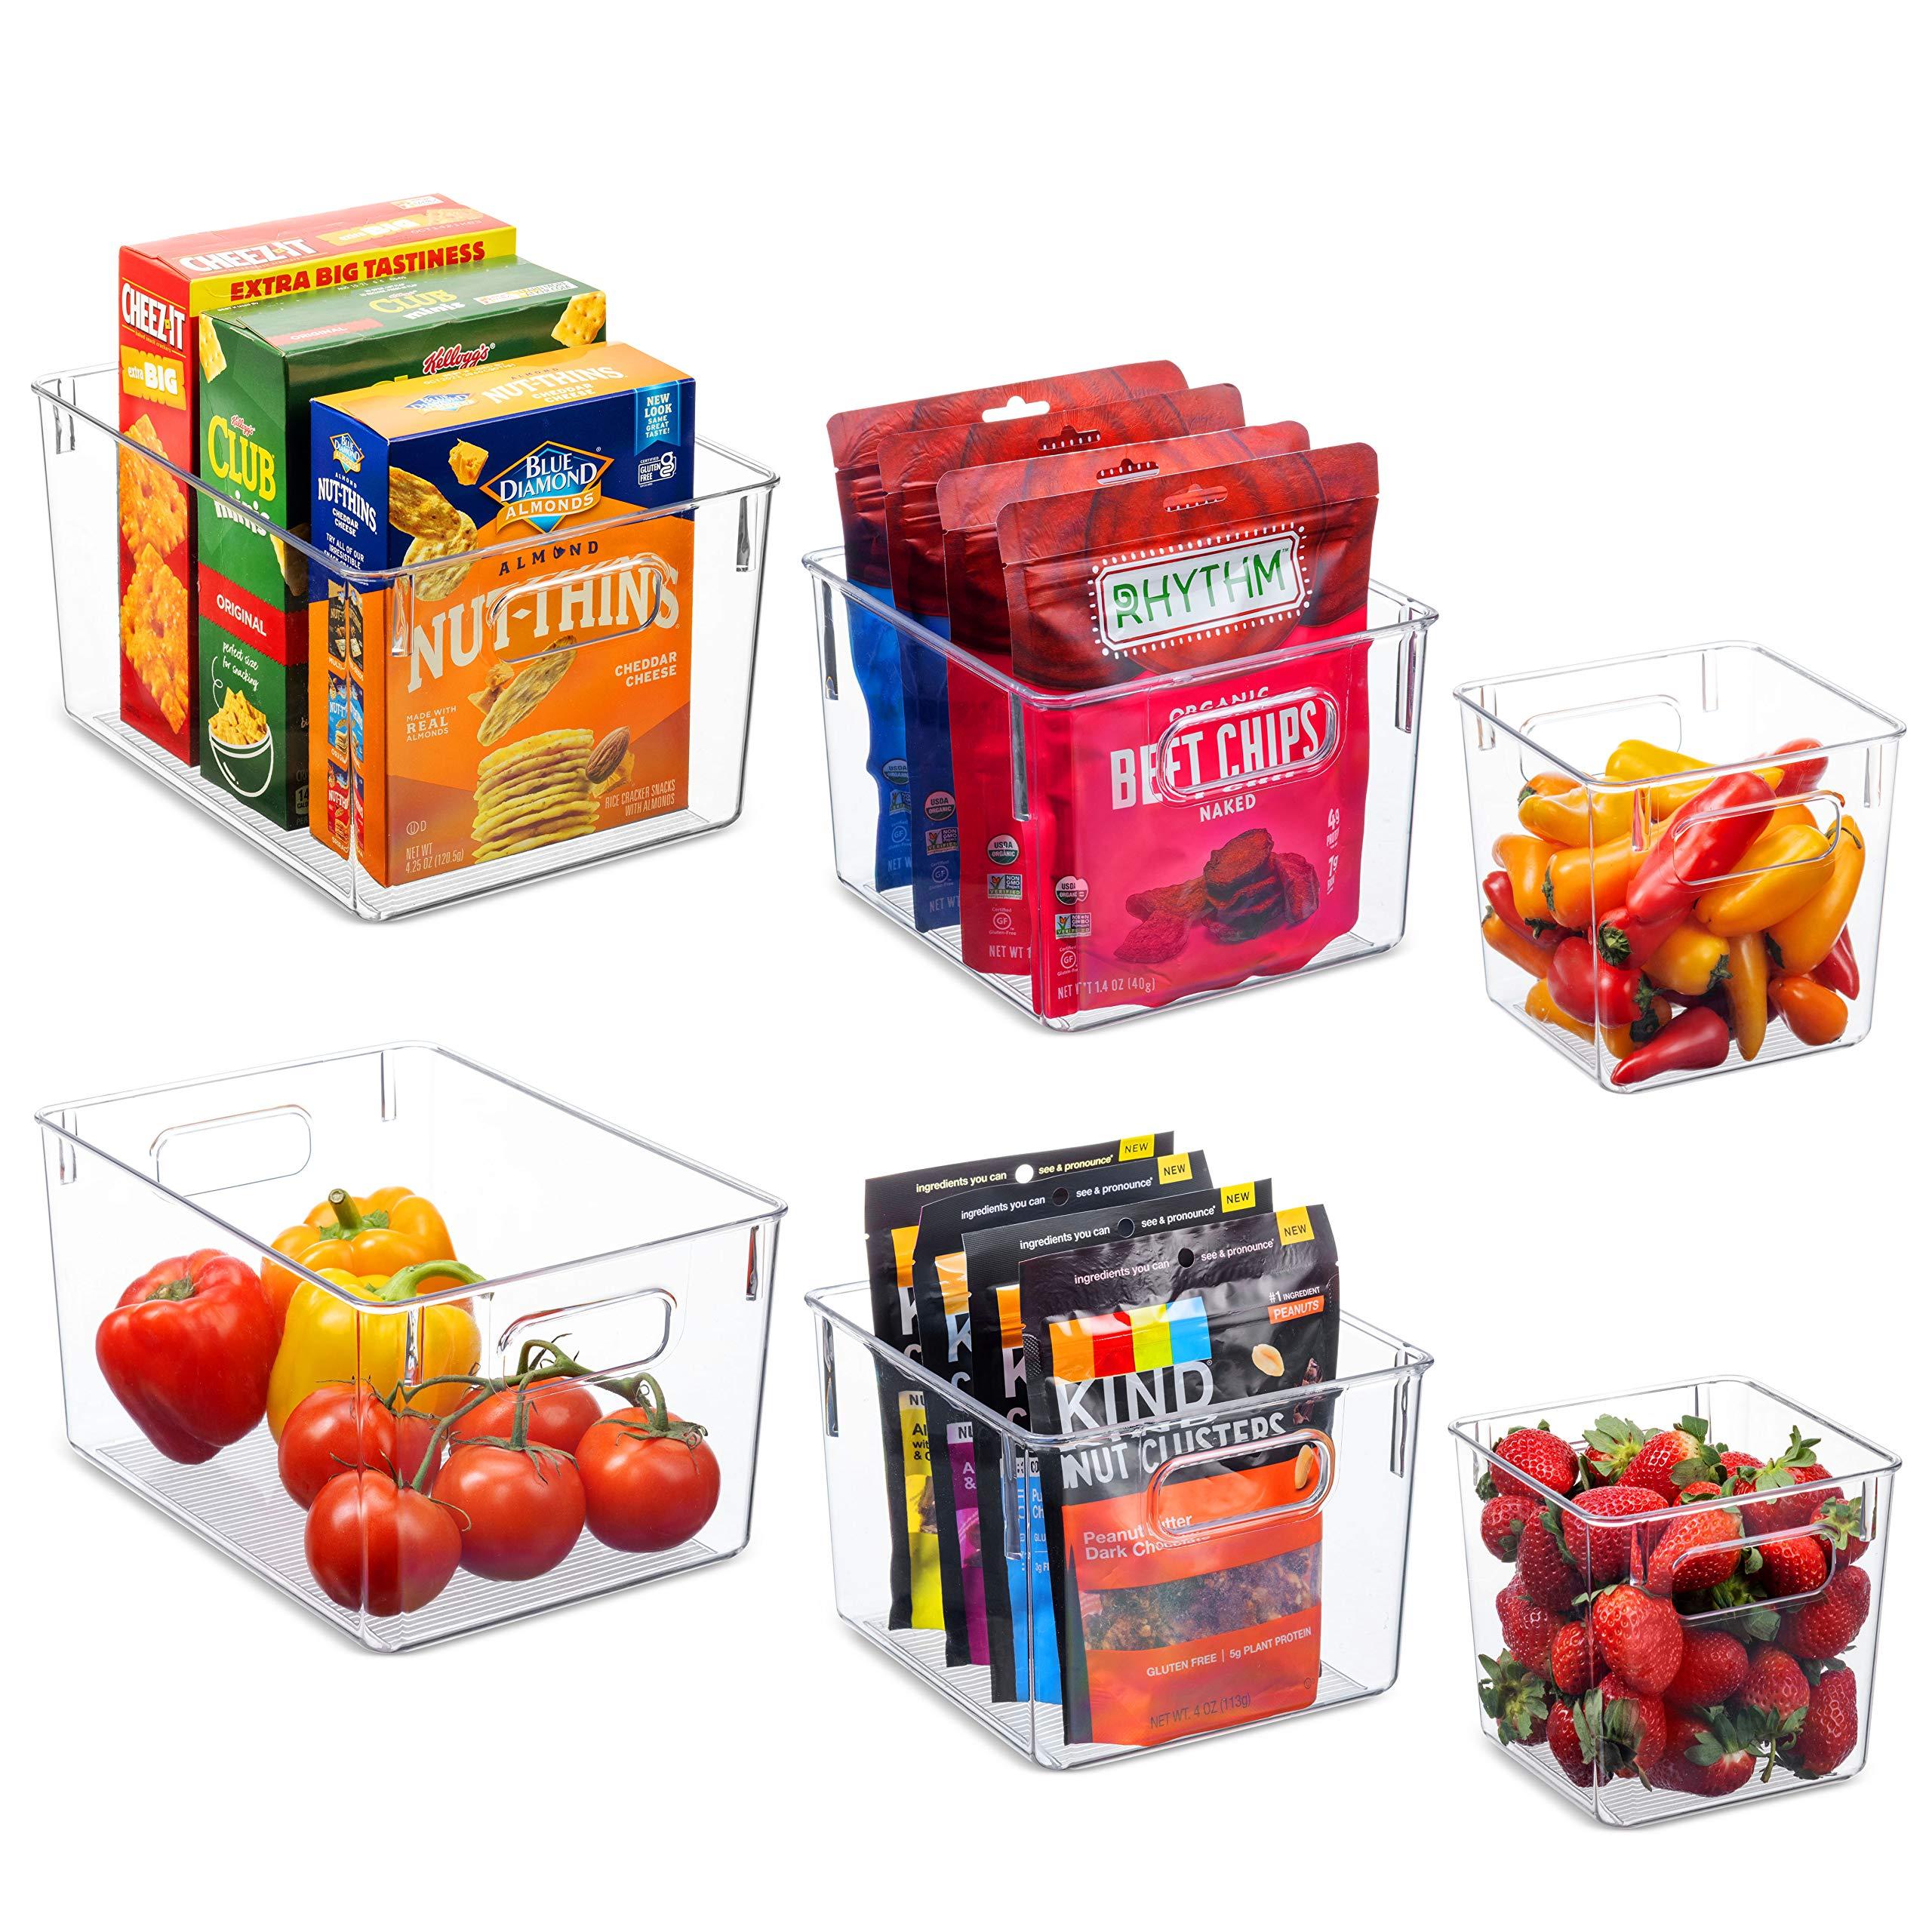 Set Of 6 Clear Pantry Organizer Bins Household Plastic Food Storage - $19.99 Amazon